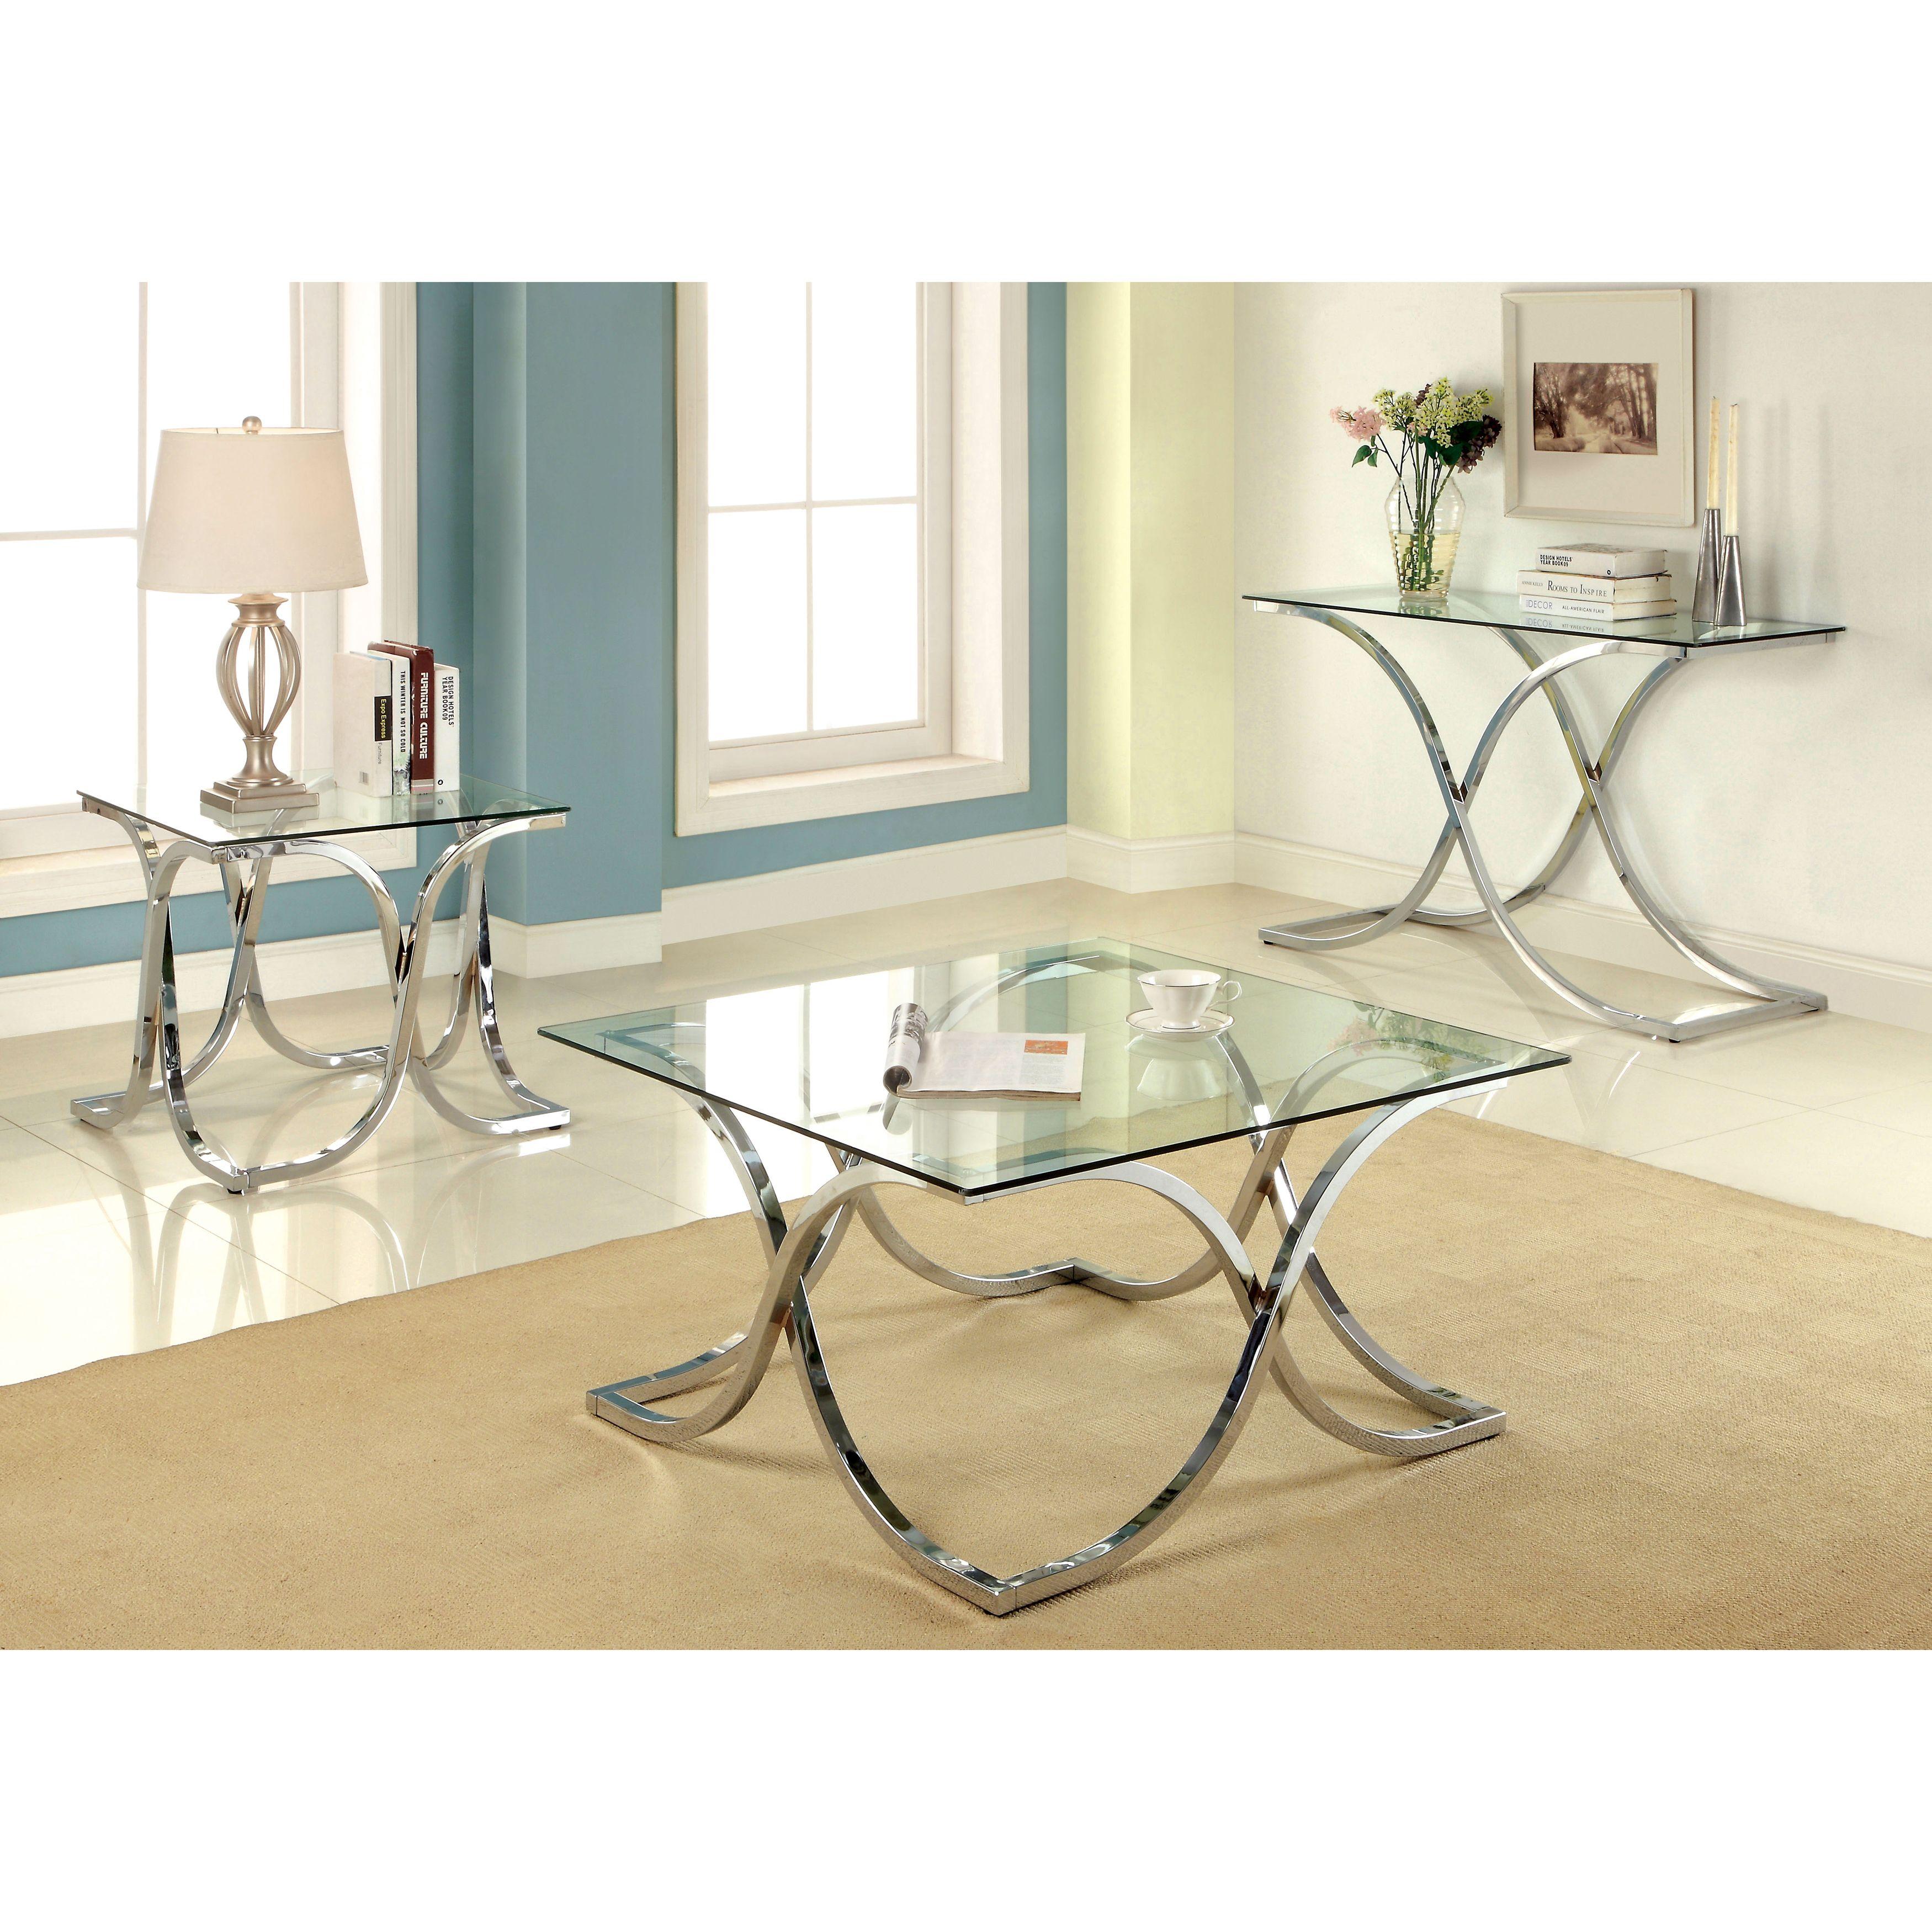 Furniture of America Artenia Modern 3-Piece Chrome Accent Table Set ...